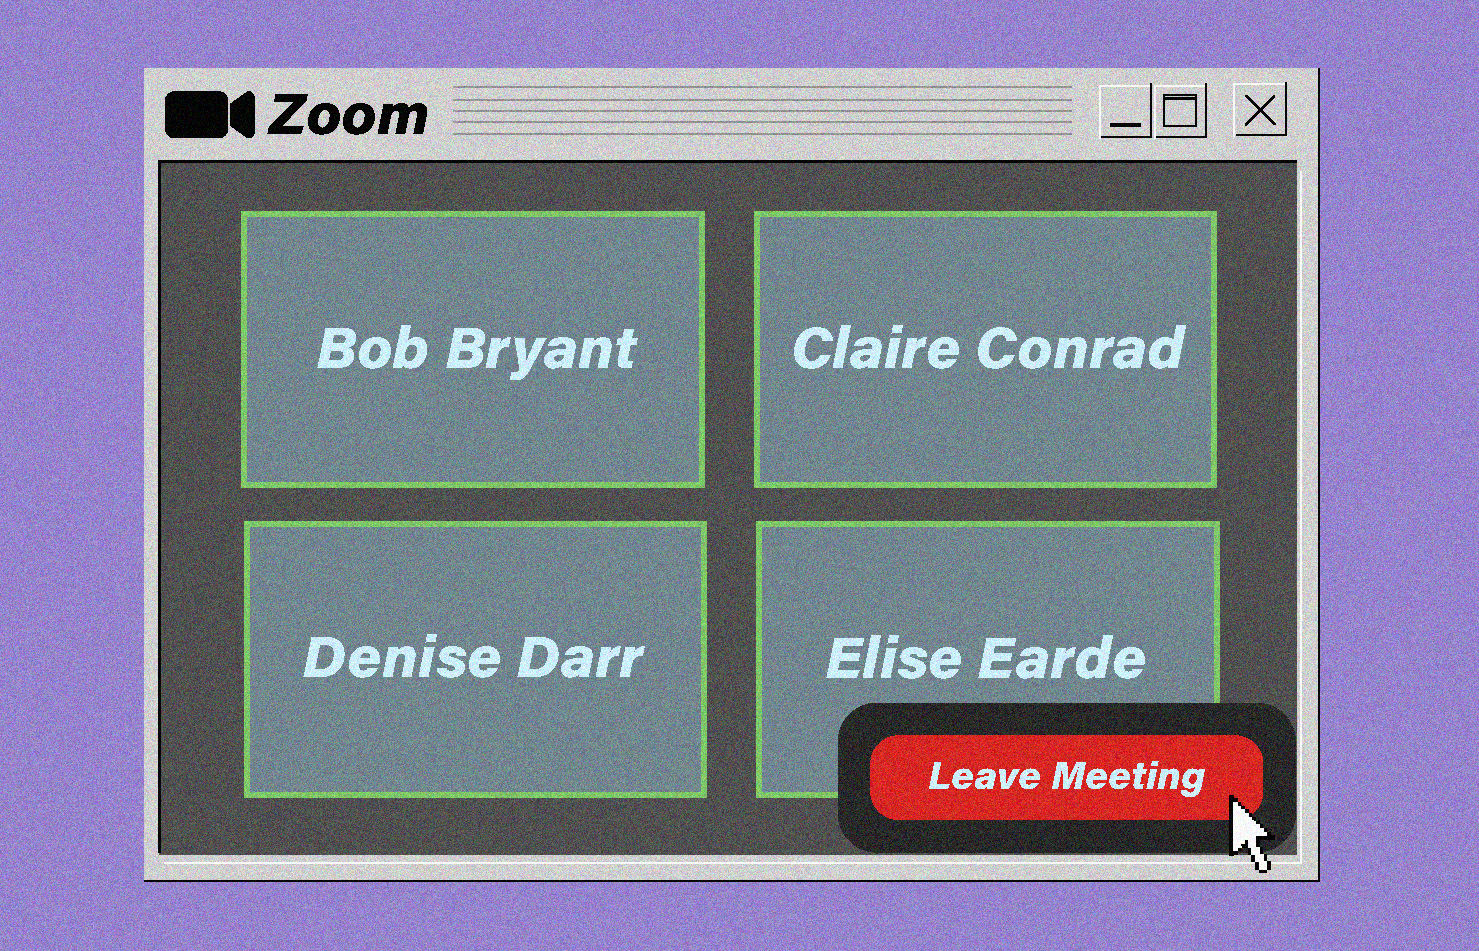 Virtual Visitas: Should You Sit Through That Random Club's Visitas Meeting?